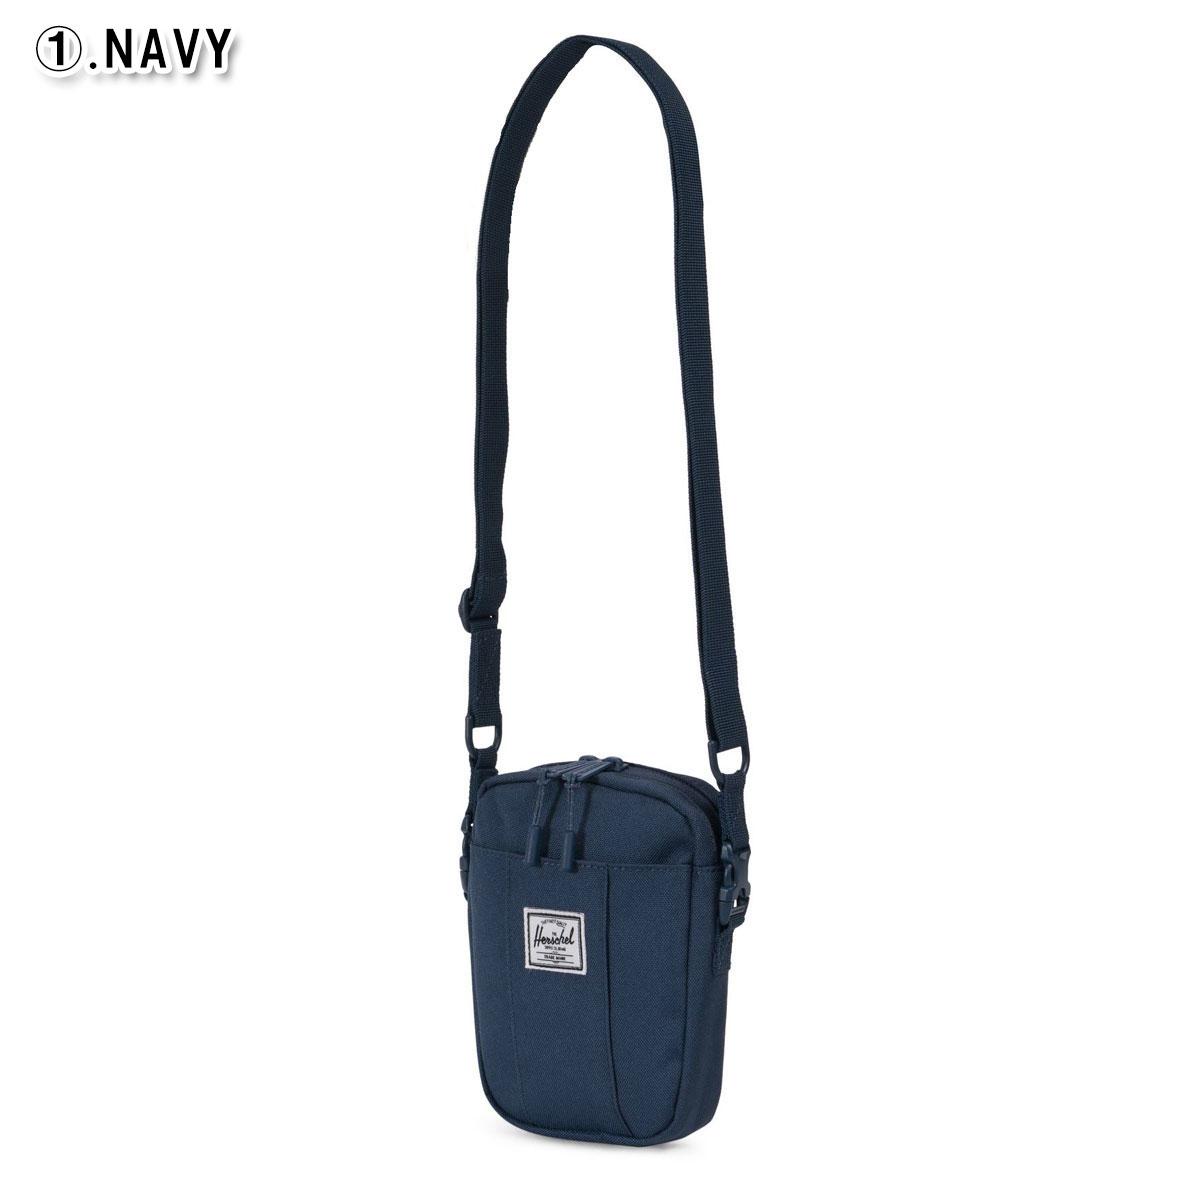 c20b228068 Hershel supply Herschel Supply regular store bag porch shoulder bag CRUZ POUCH  CLASSICS | HIP SACKS 10388